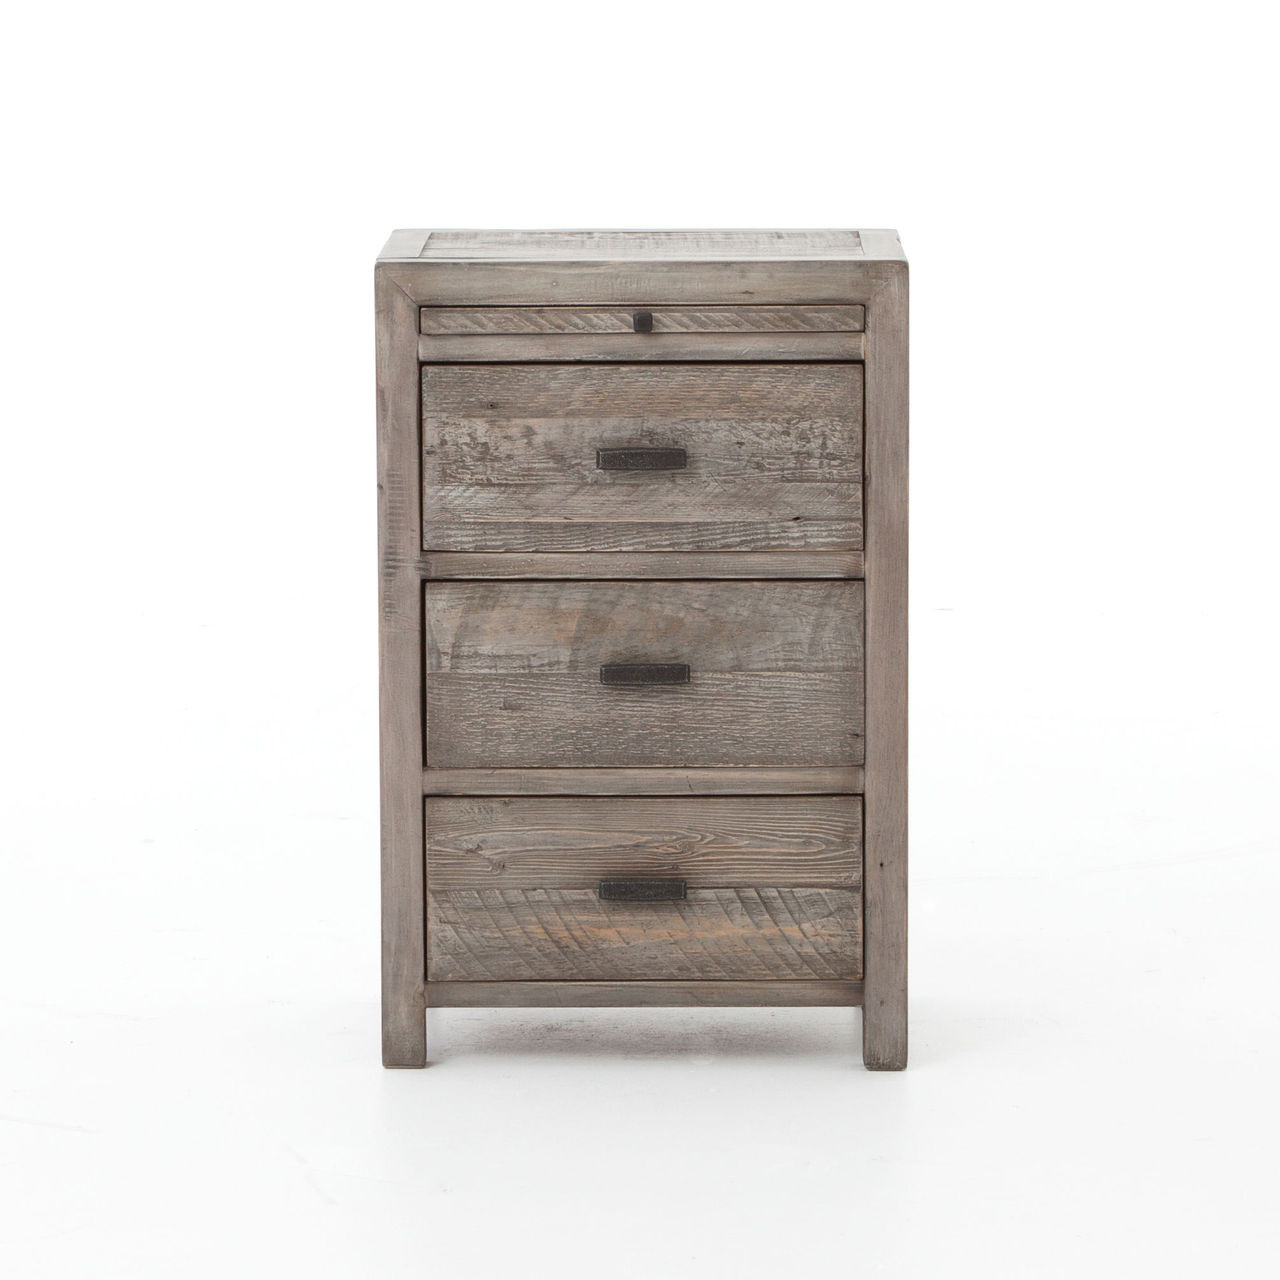 ... Caminito Reclaimed Wood 3 Drawers Nightstand, Grey ... - Caminito Grey Reclaimed Wood 3 Drawers Nightstand Zin Home